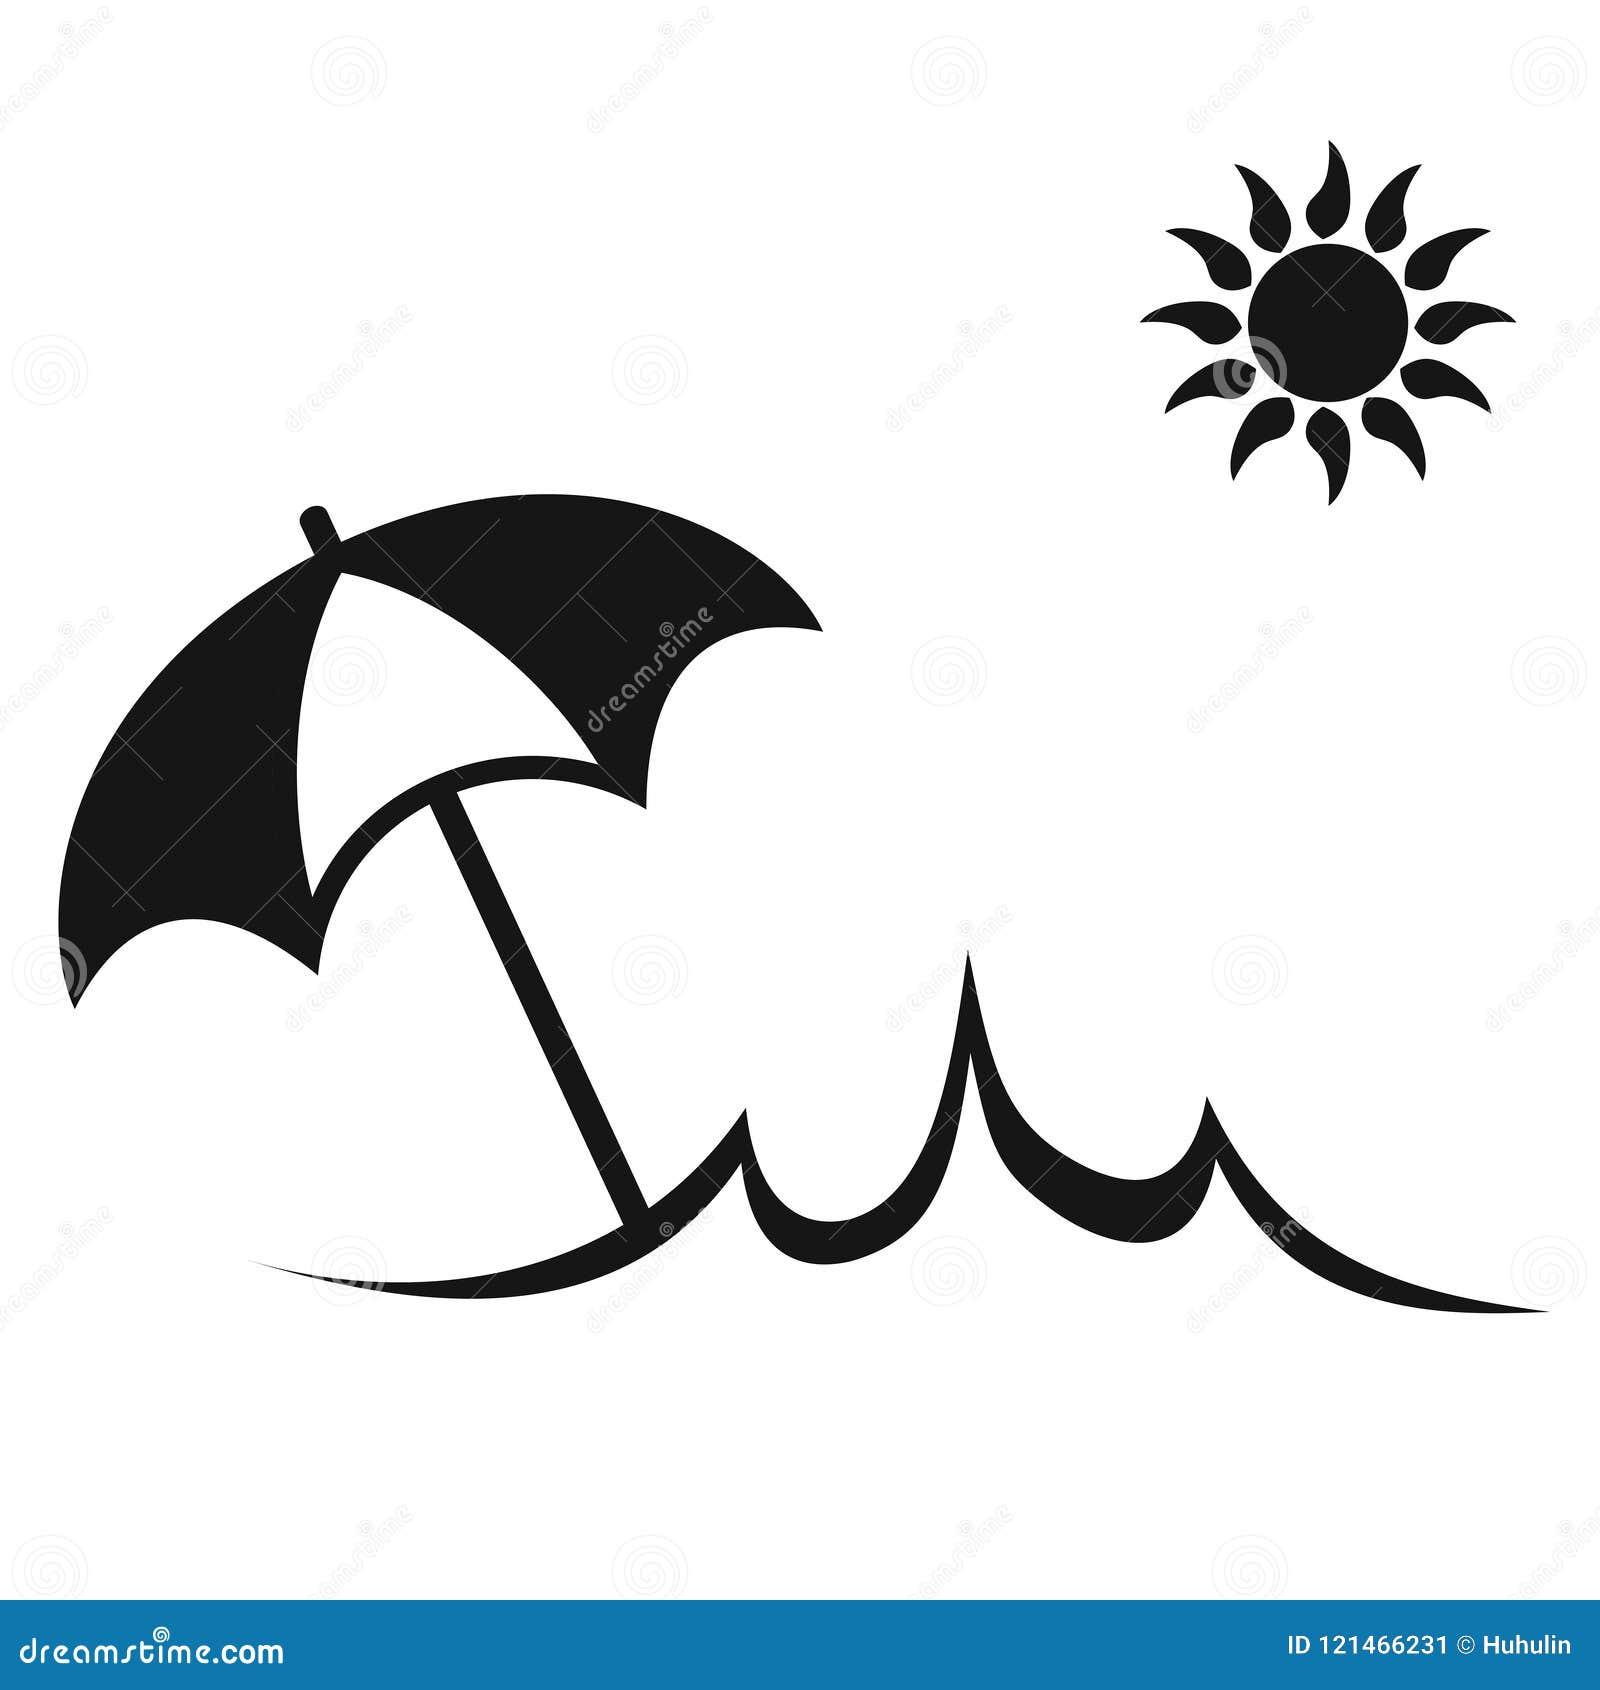 simple sun summer umbrella beach icon stock vector illustration of icon sunny 121466231 https www dreamstime com isolated simple sun summer umbrella beach icon white background simple sun summer umbrella beach icon image121466231